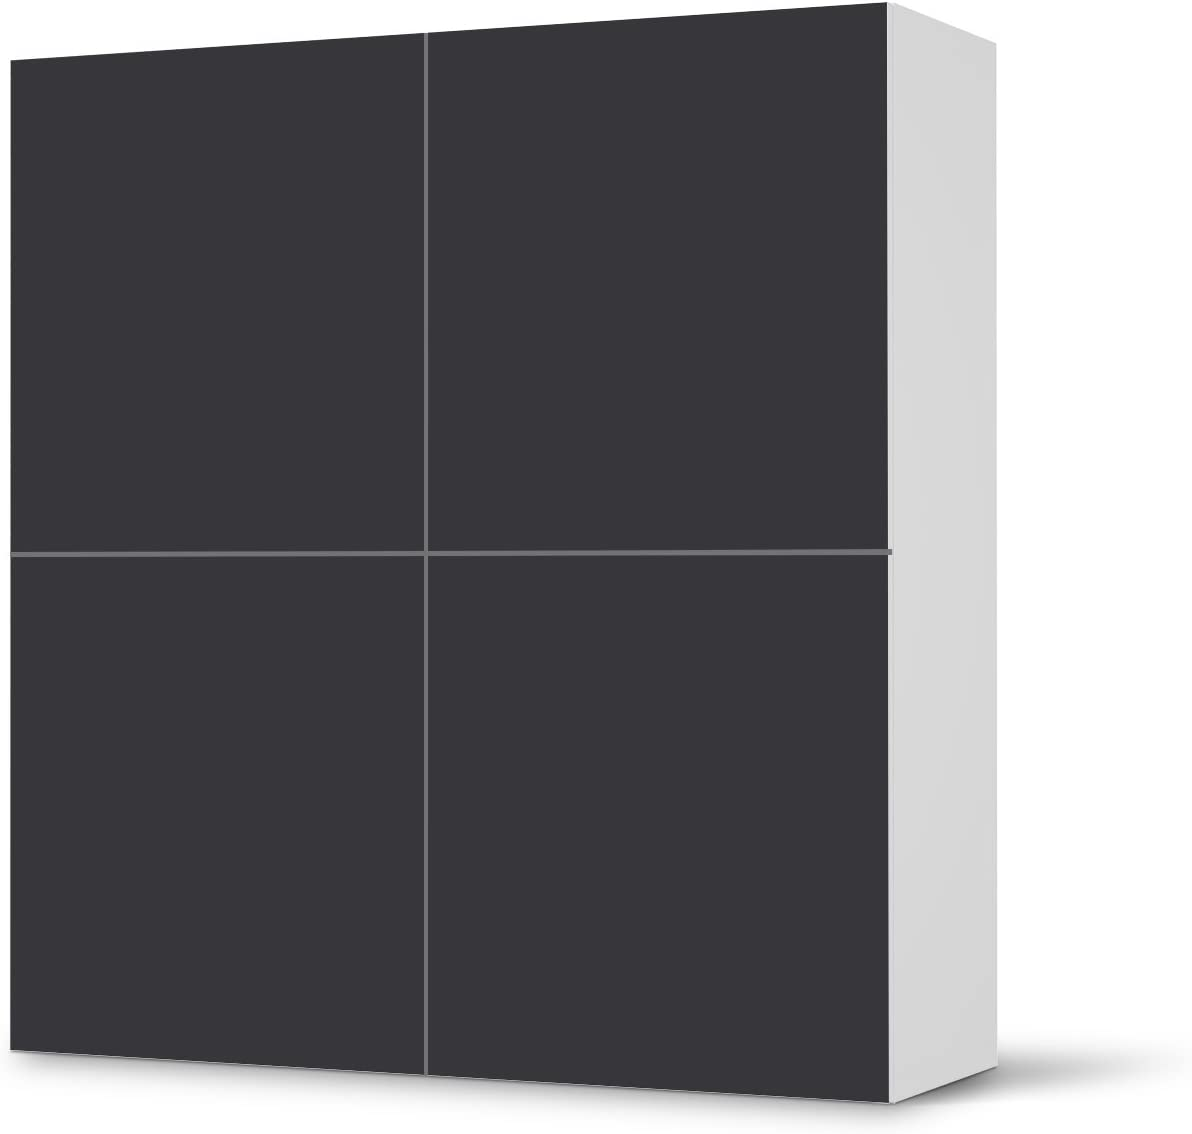 Ikea Besta Cabinet Square 4 A Door Furniture Self Adhesive Film